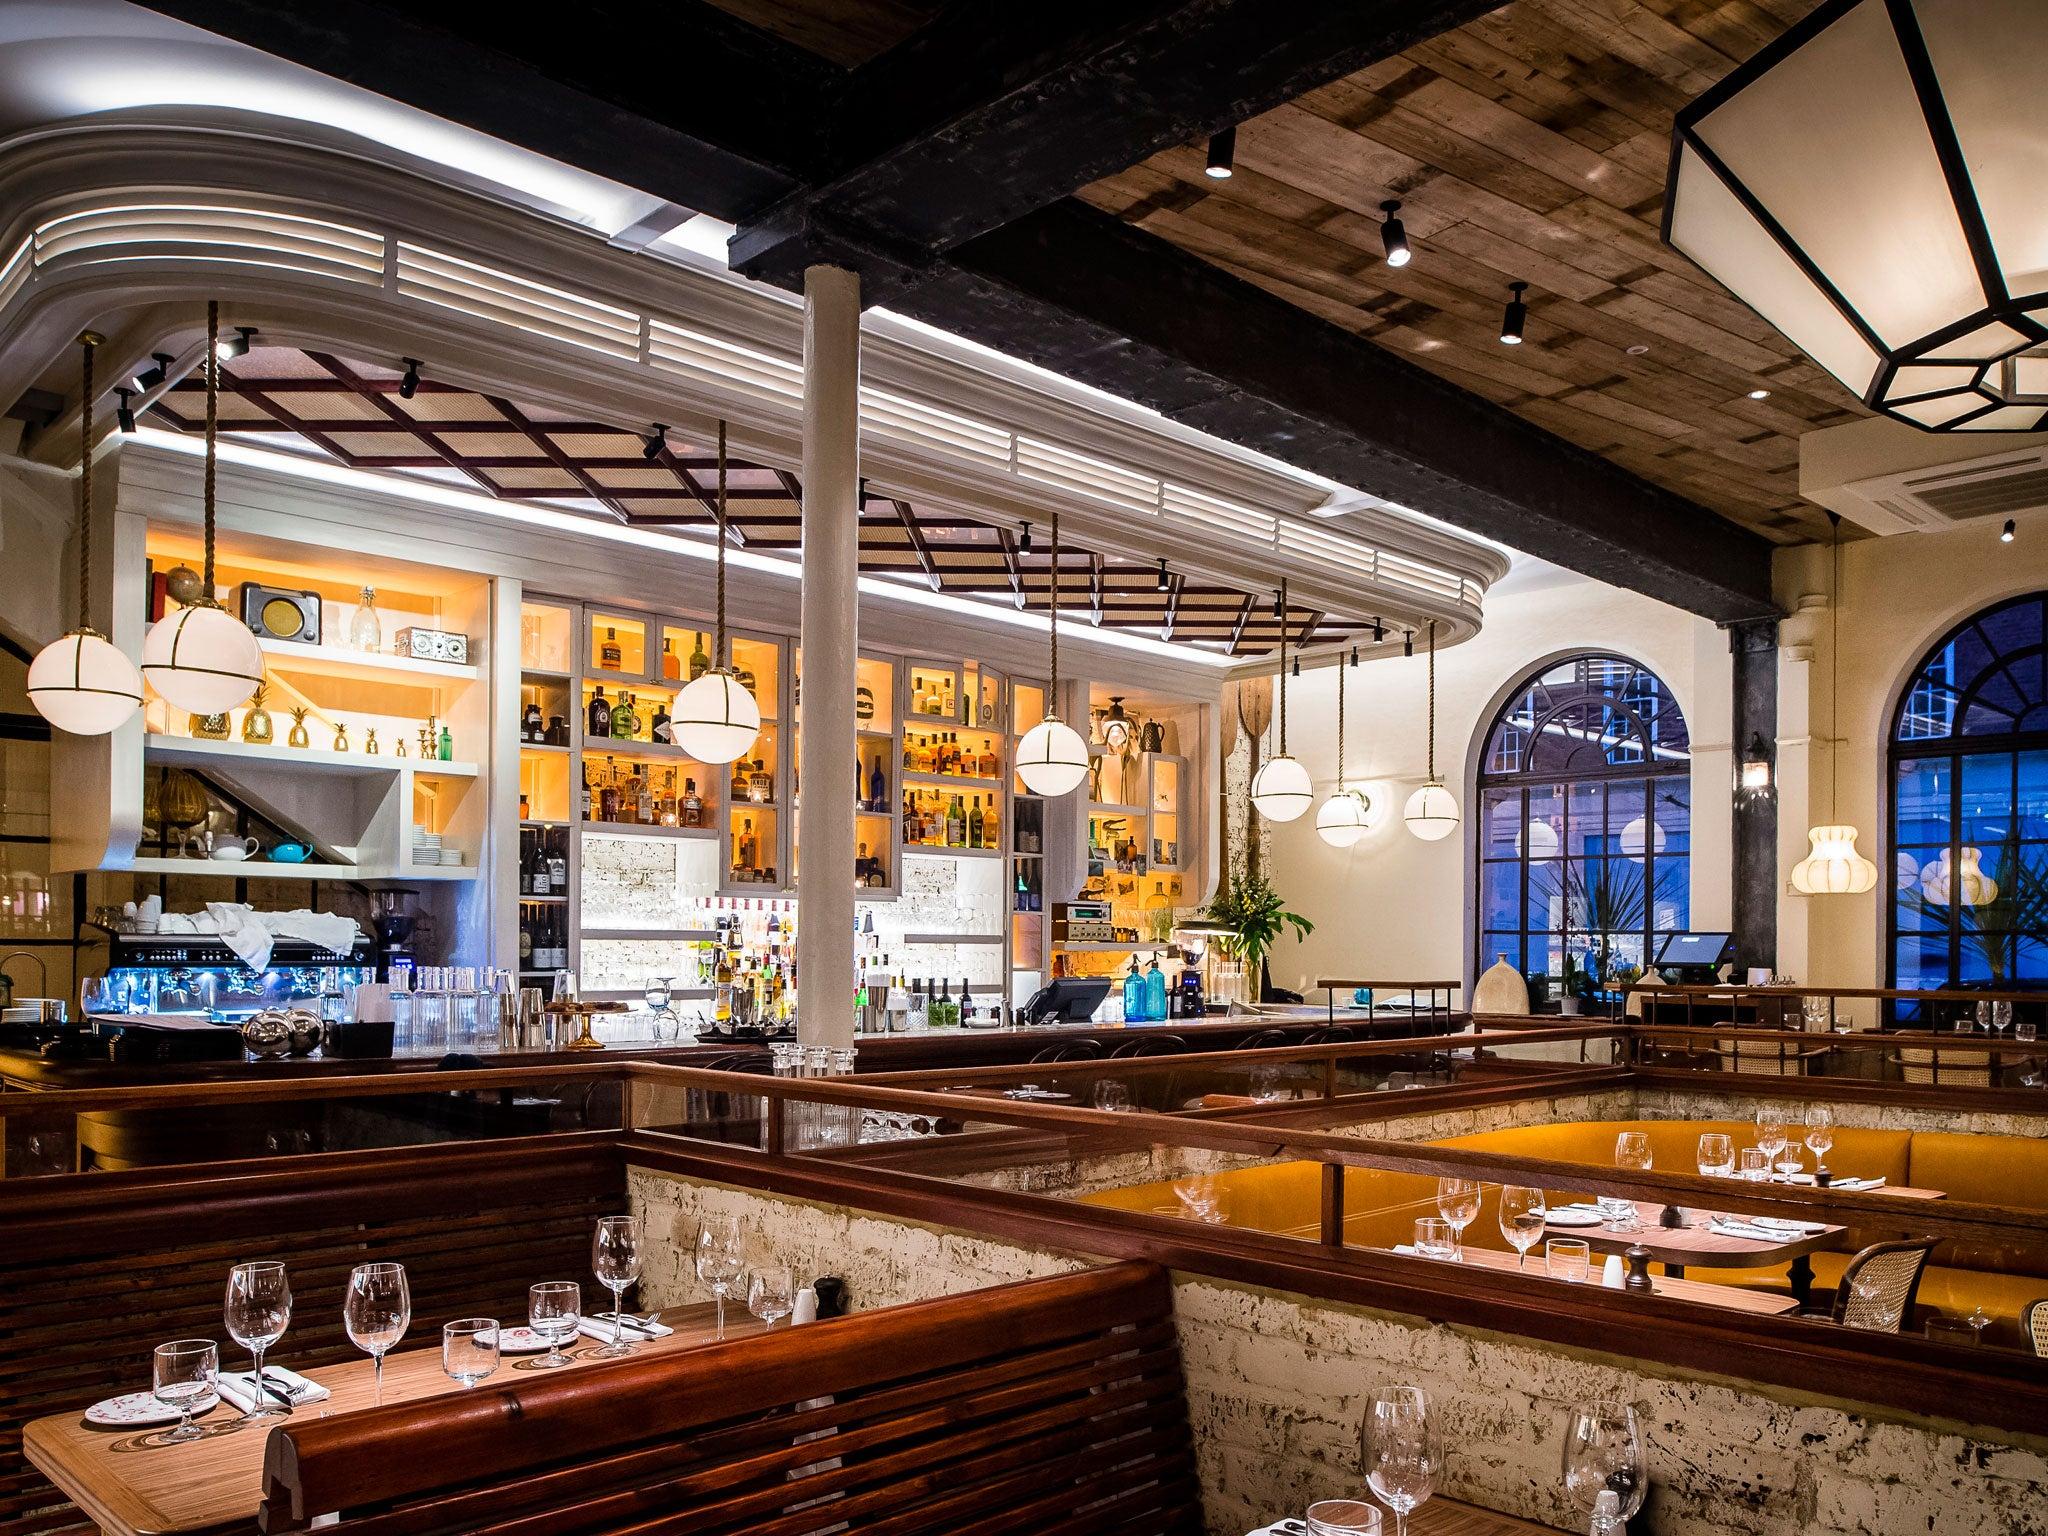 orlds best dressed restaurants - HD2048×1536